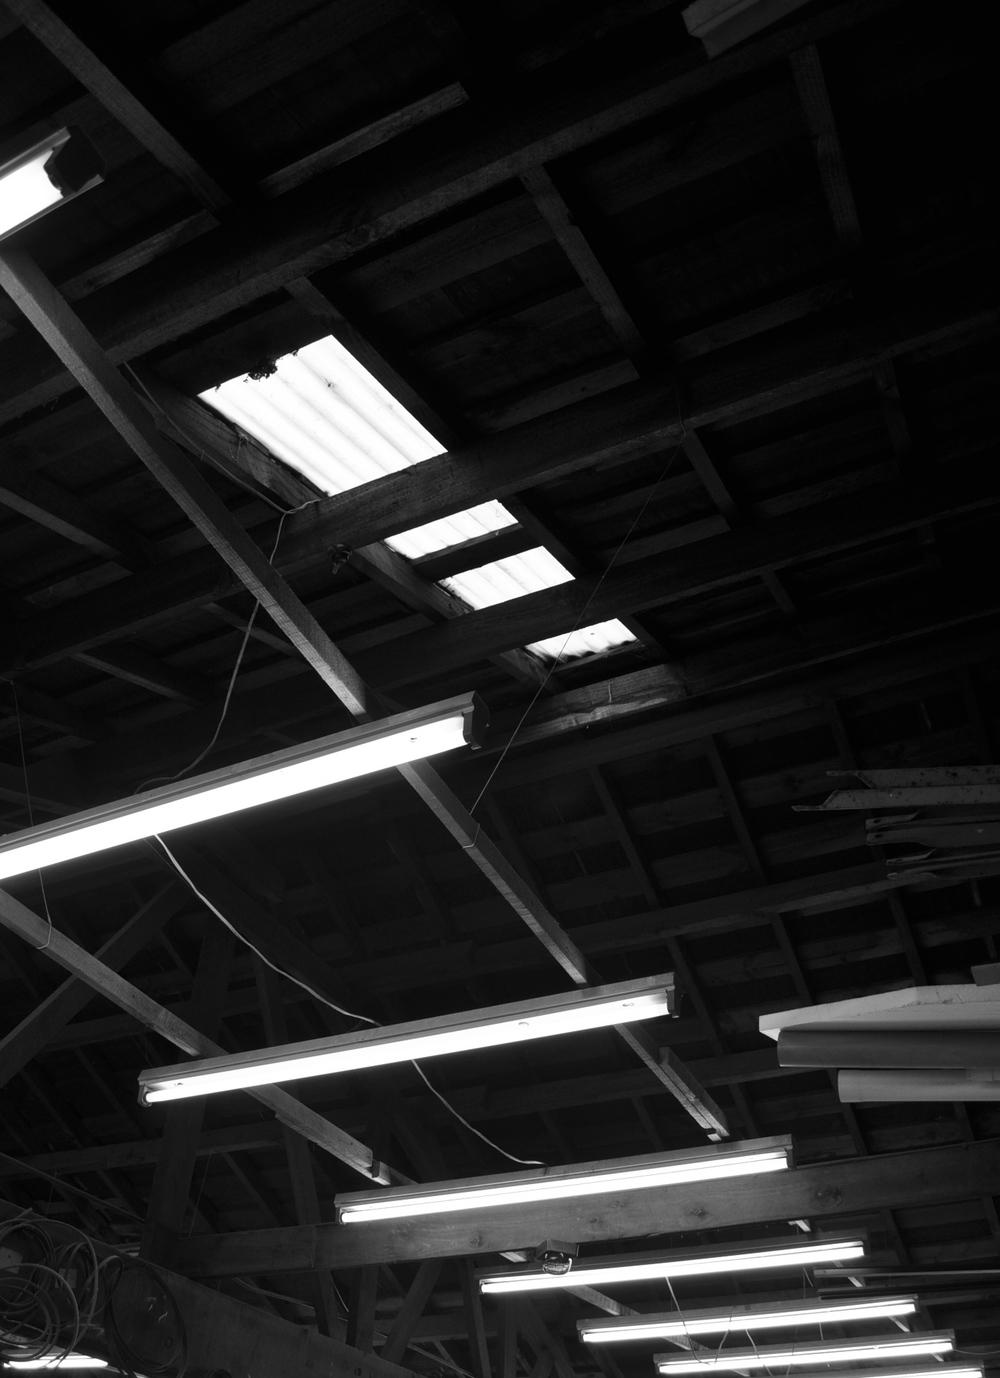 Light Ladder, summer 2011